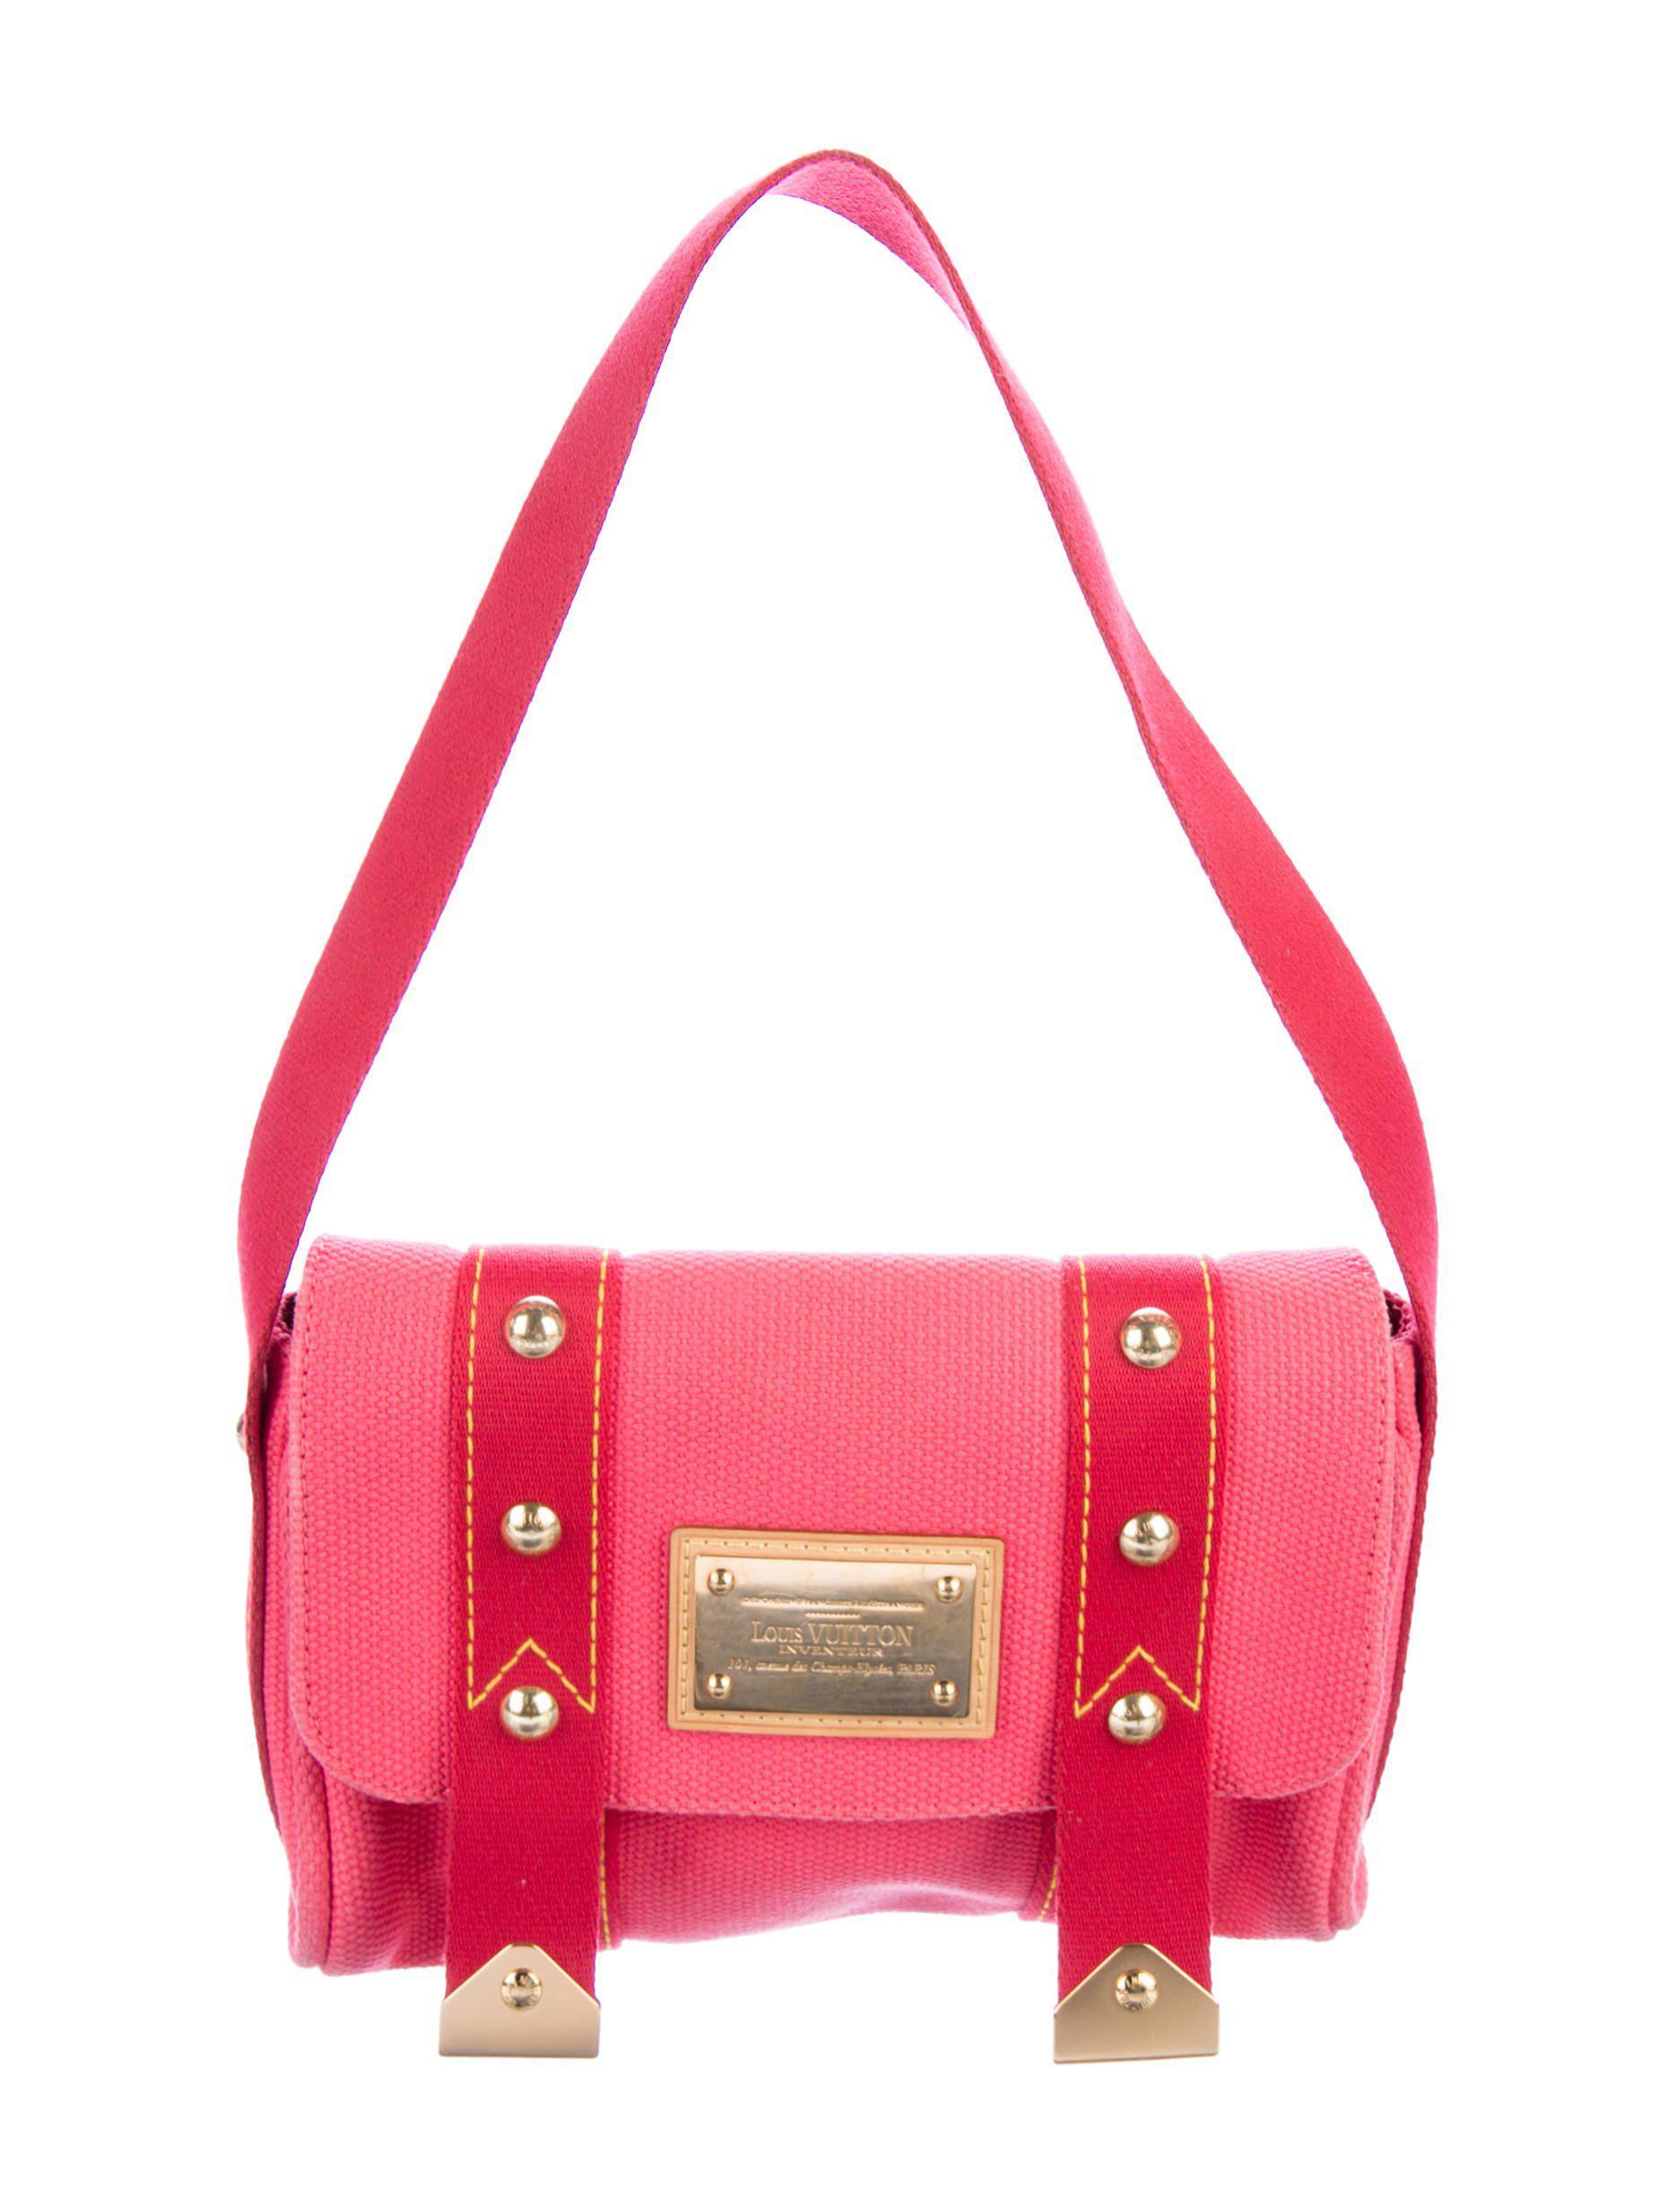 dba49114d121 Lyst - Louis Vuitton Antigua Sac Rabat Bag Pink in Natural